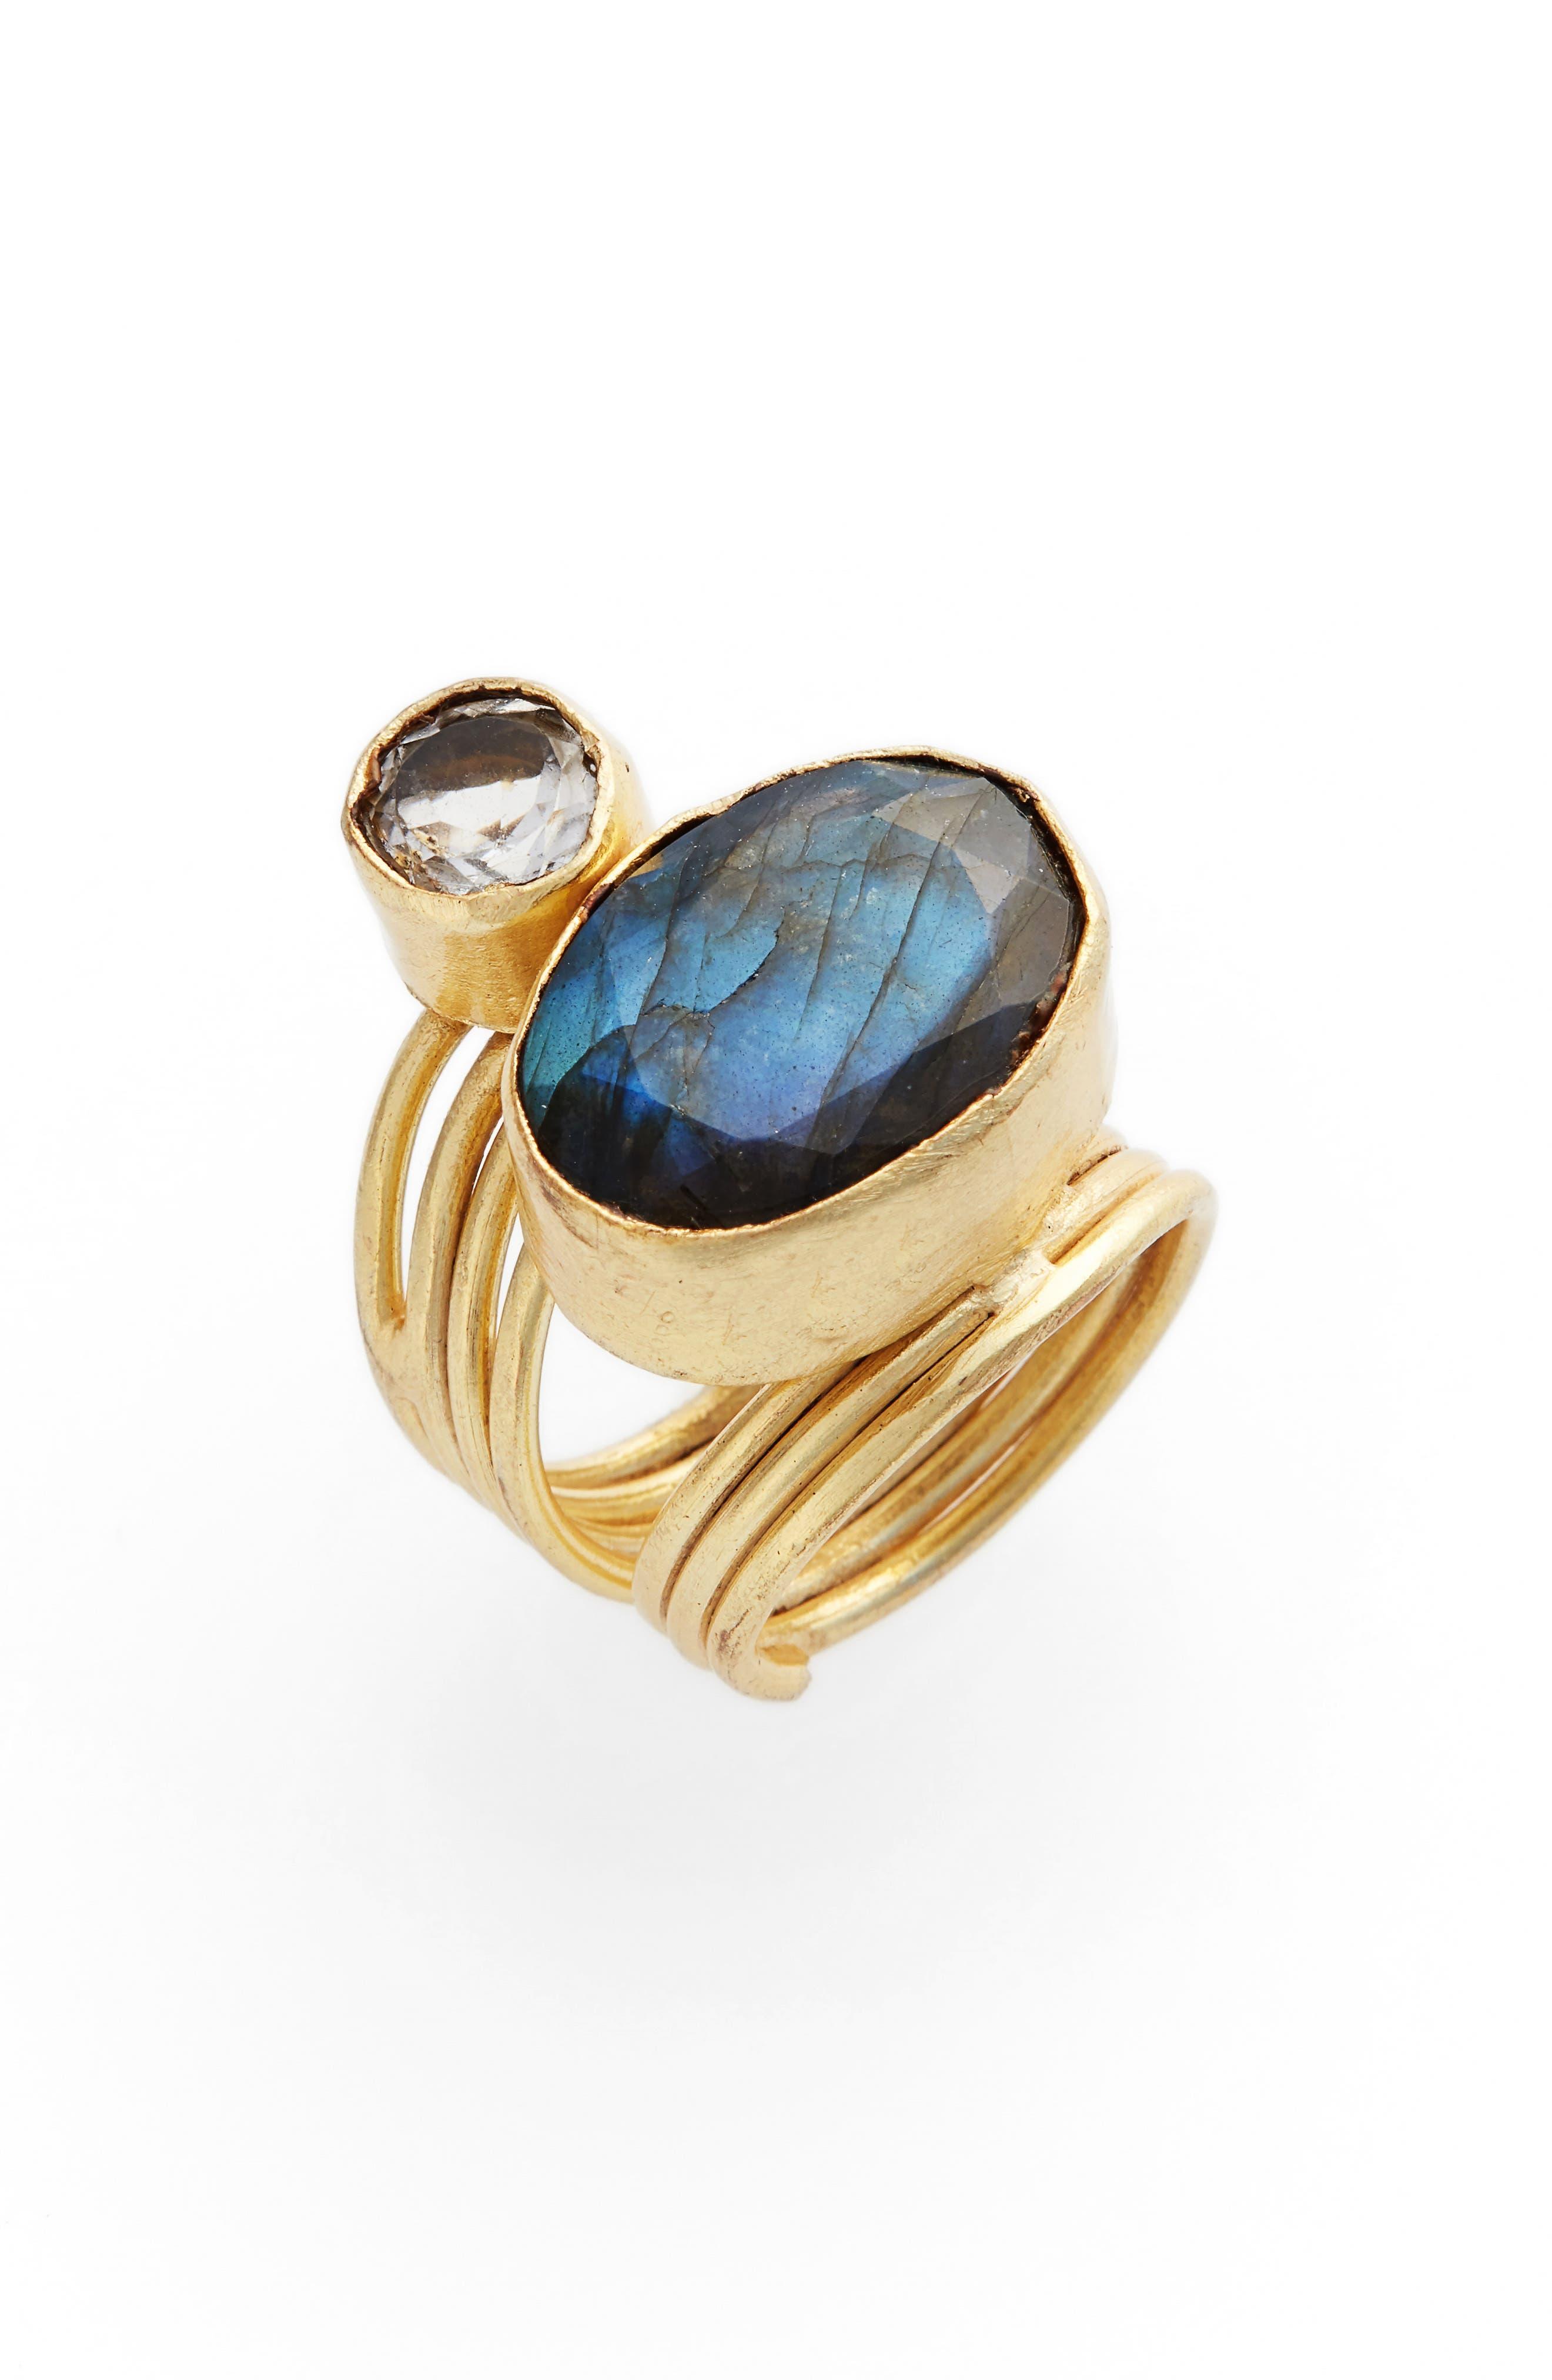 Luisa Labradorite & Crystal Ring,                         Main,                         color, Gold/ Labradoriate